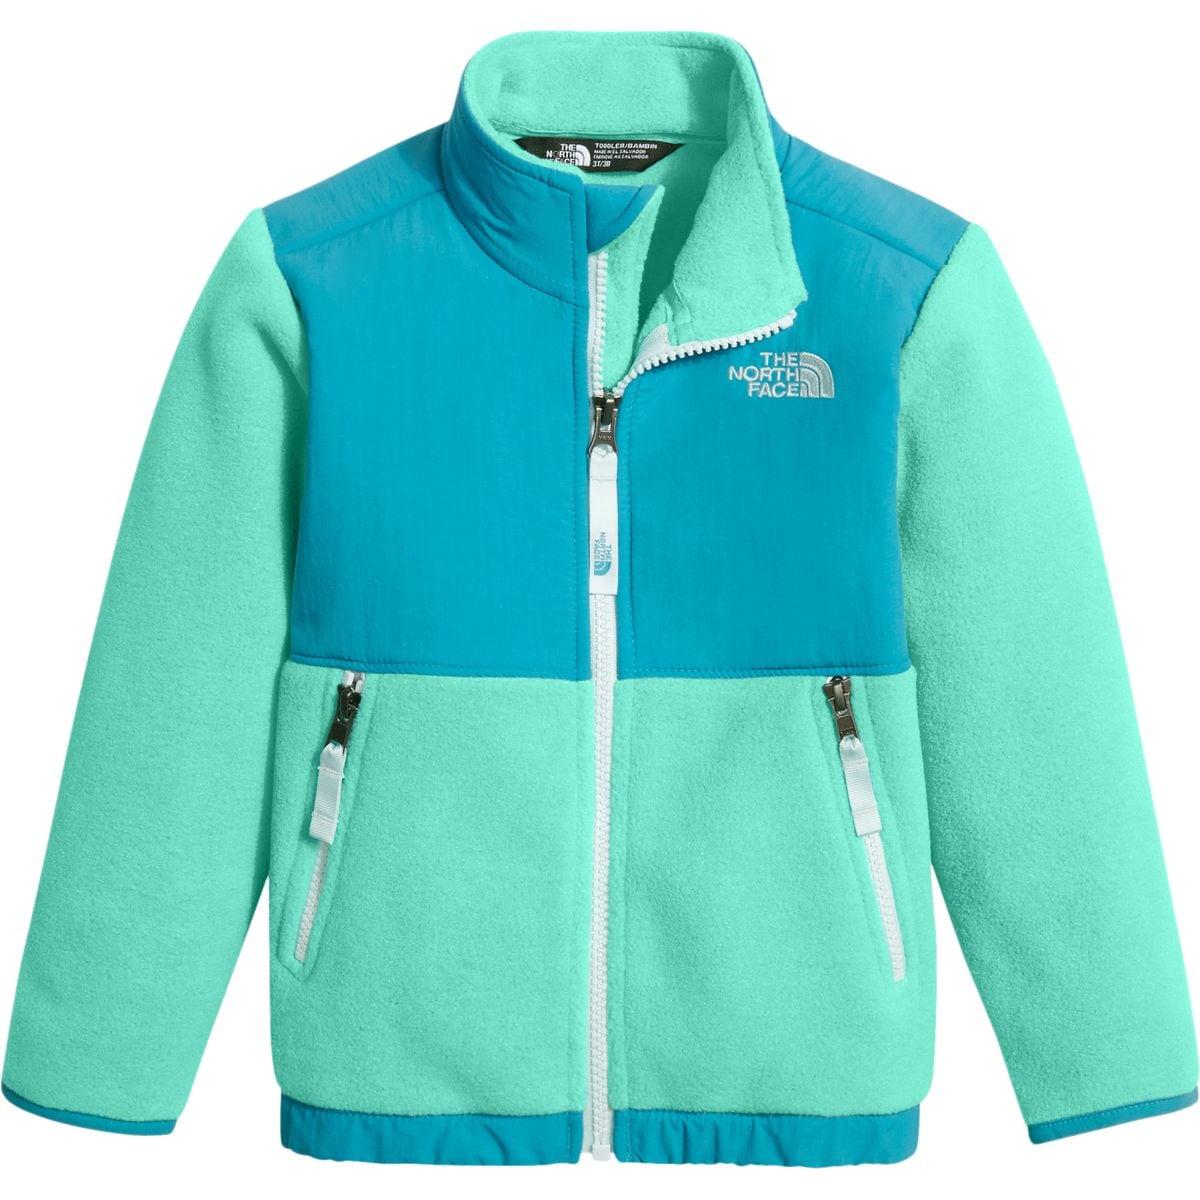 The North Face Denali Fleece Jacket - Toddler Girls